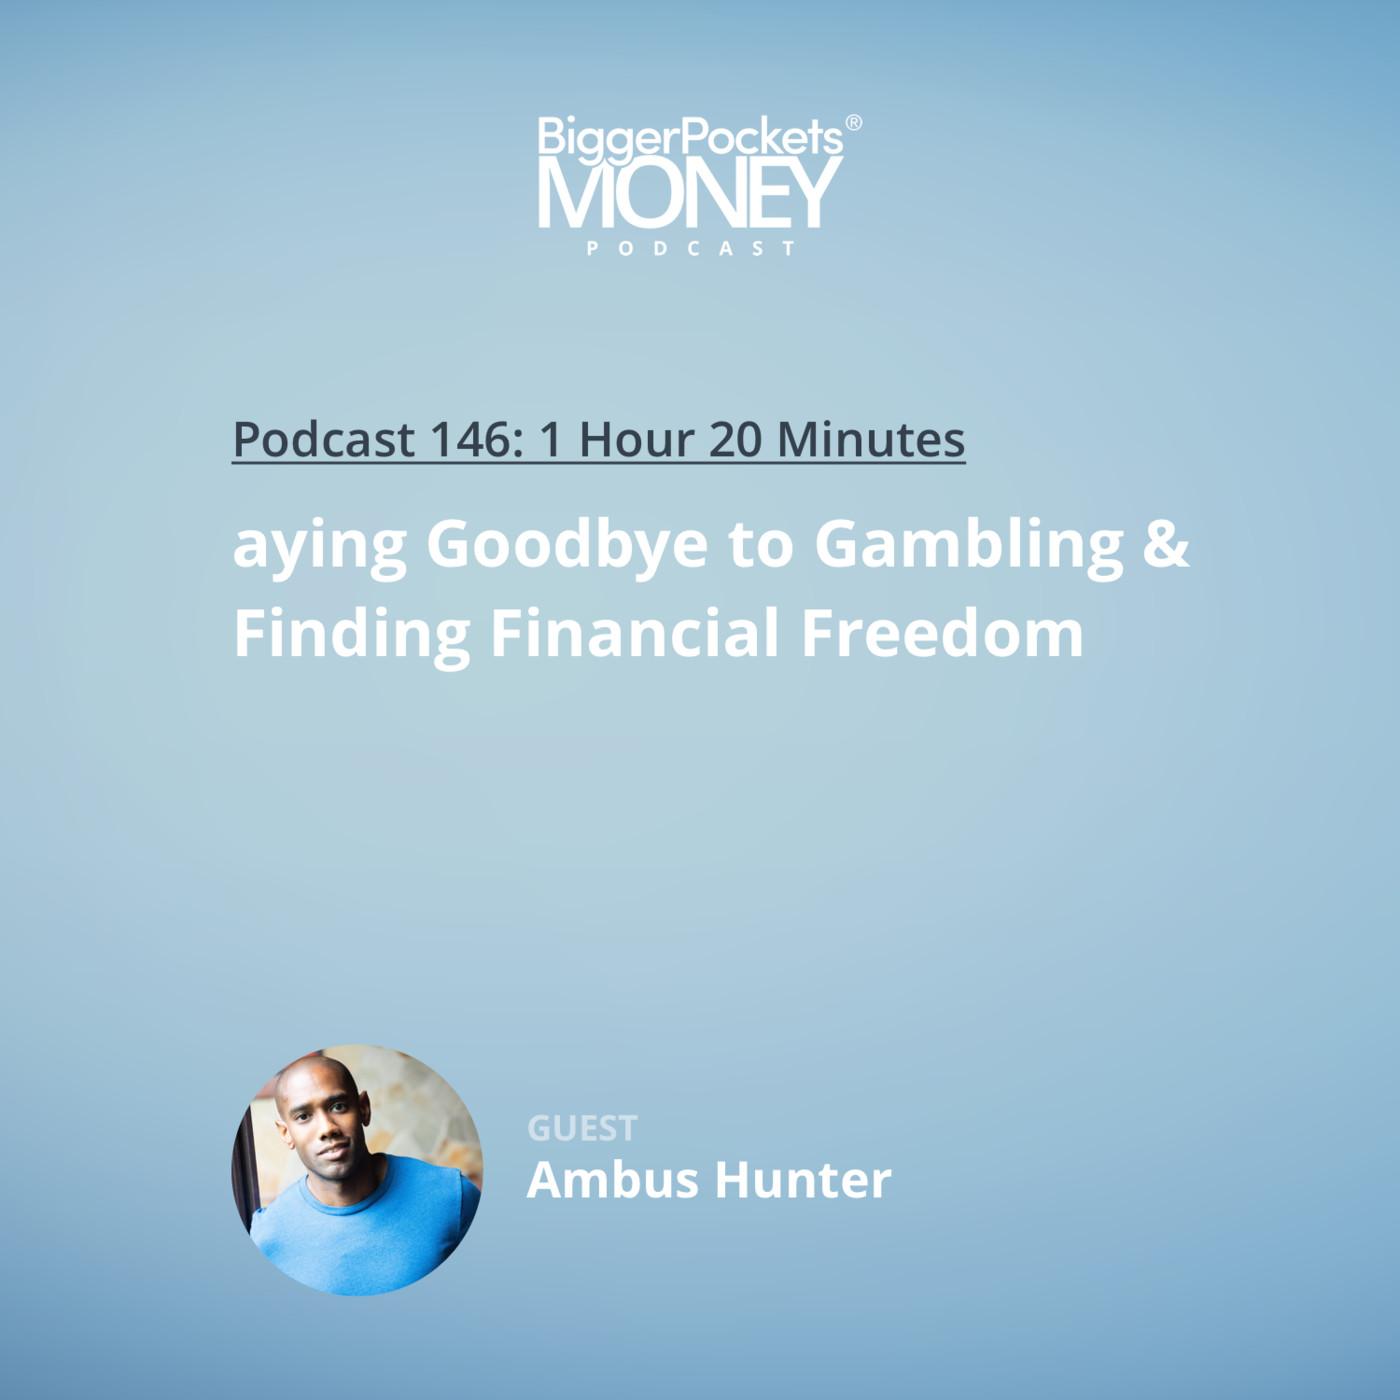 146: Saying Goodbye to Gambling & Finding Financial Freedom with Ambus Hunter